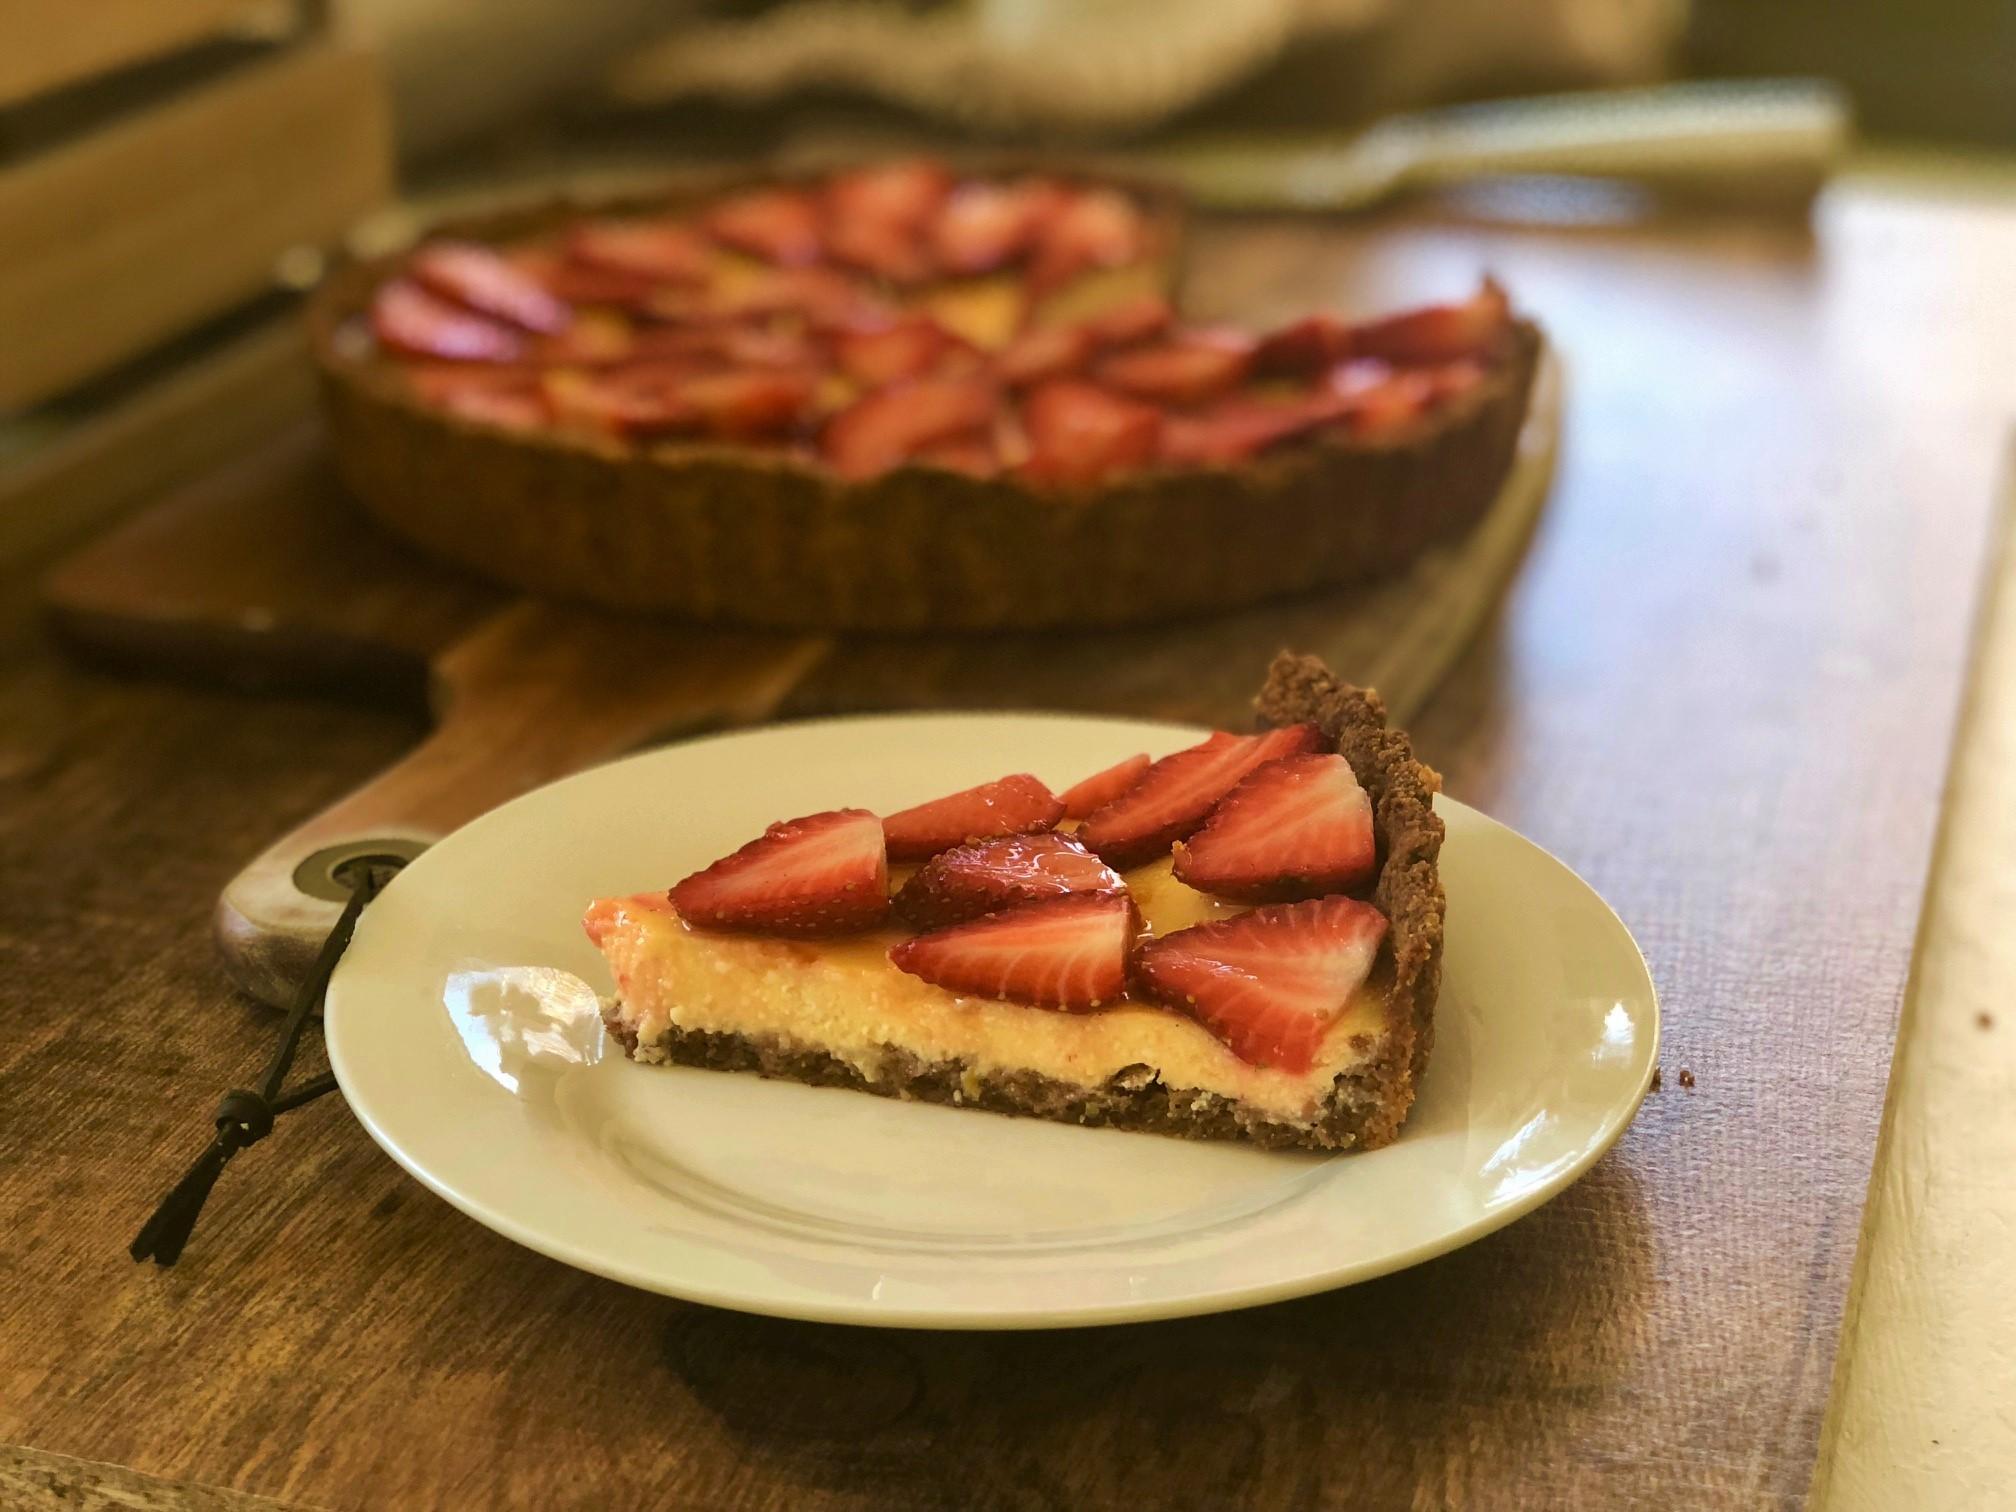 Lemon And Ricotta Tart With Glazed Strawberries